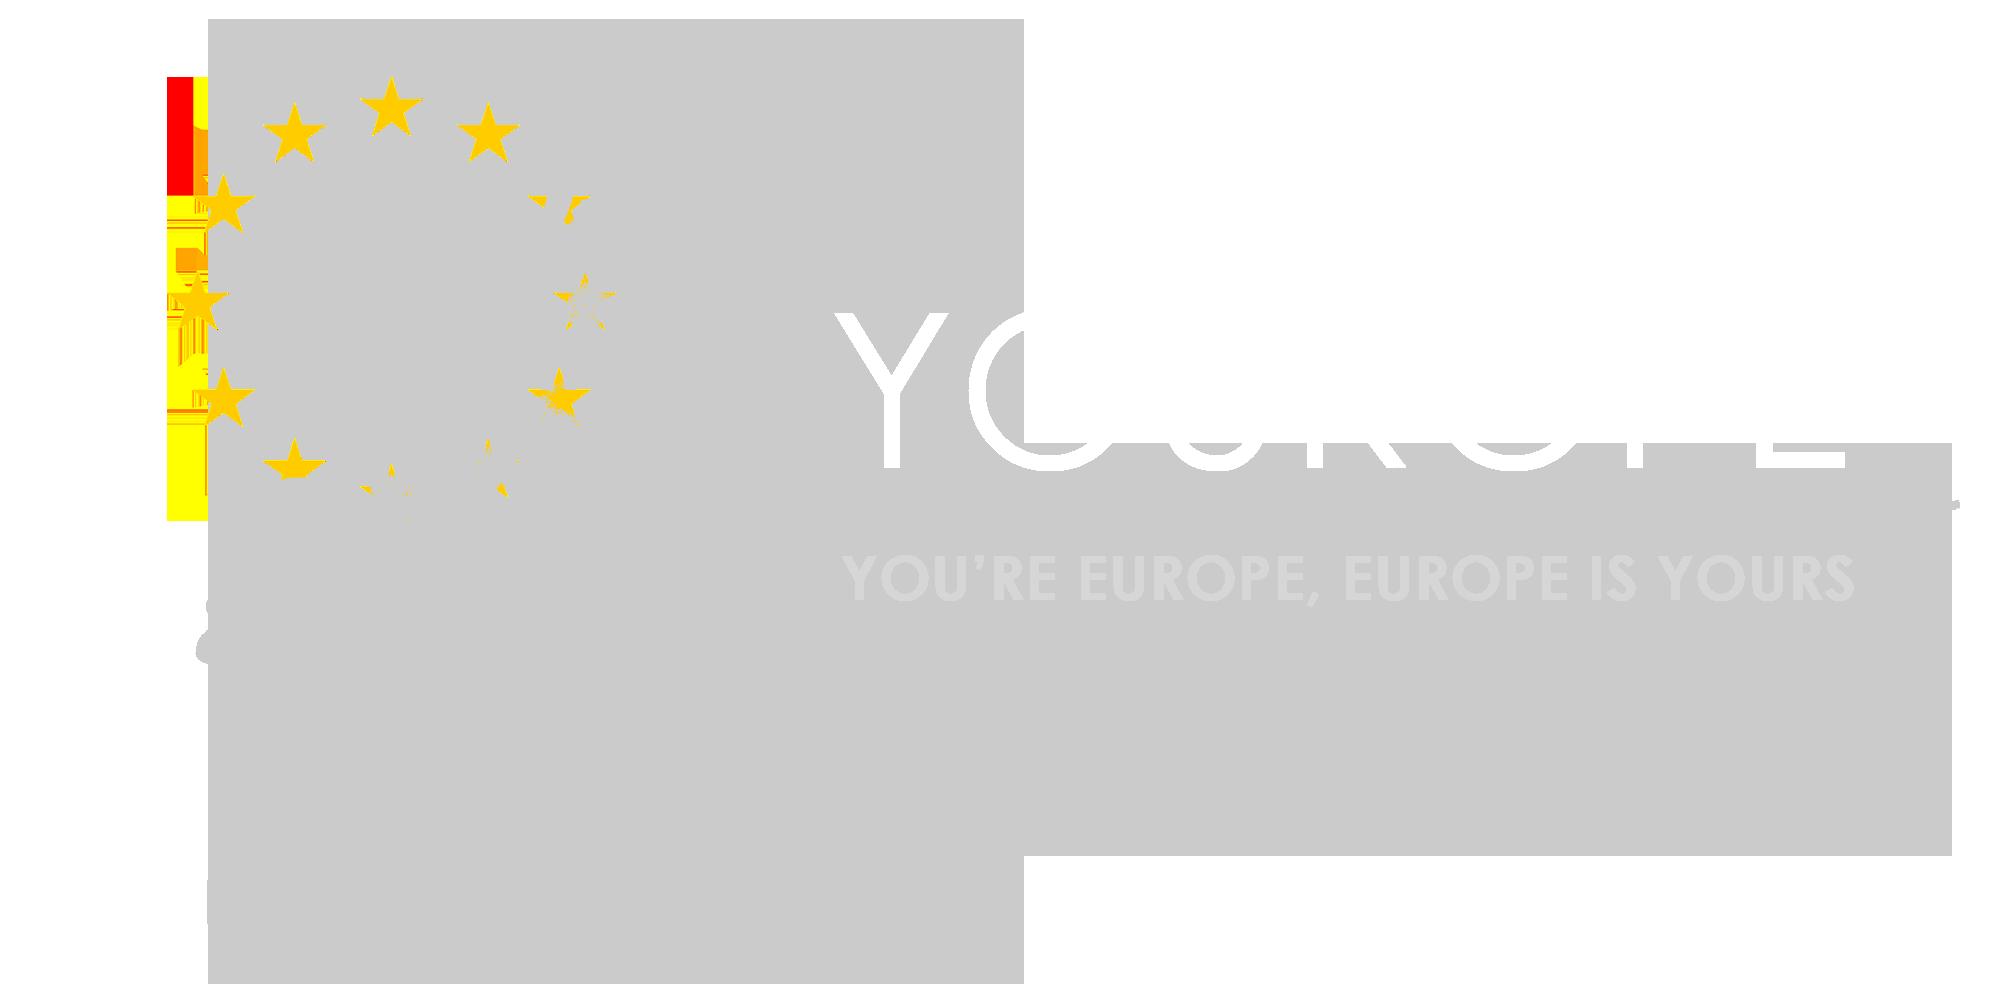 YOUROPE